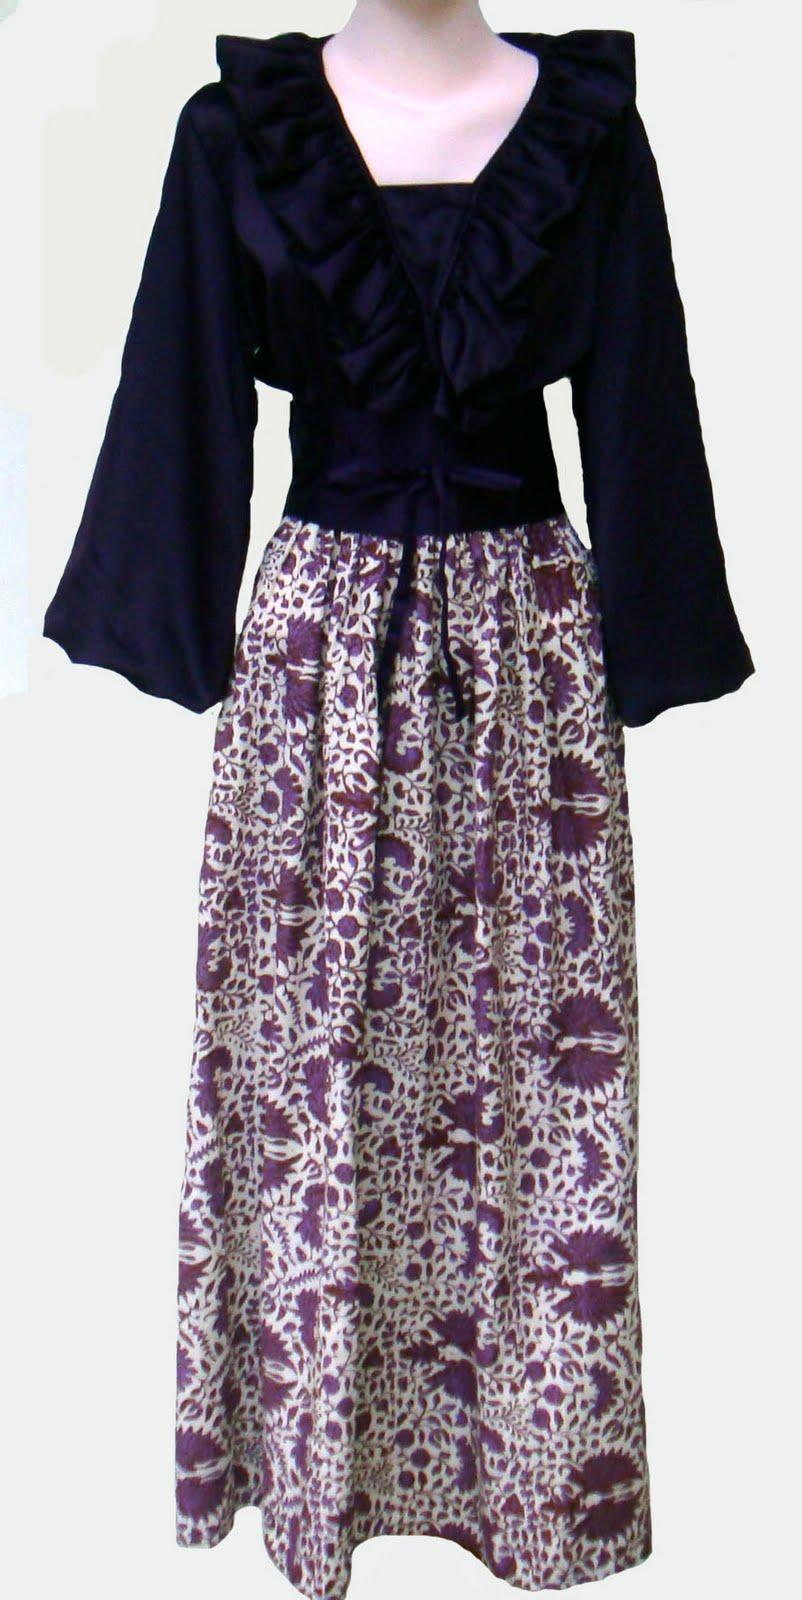 Busana Muslimah-Ku: Gamis Batik Modern